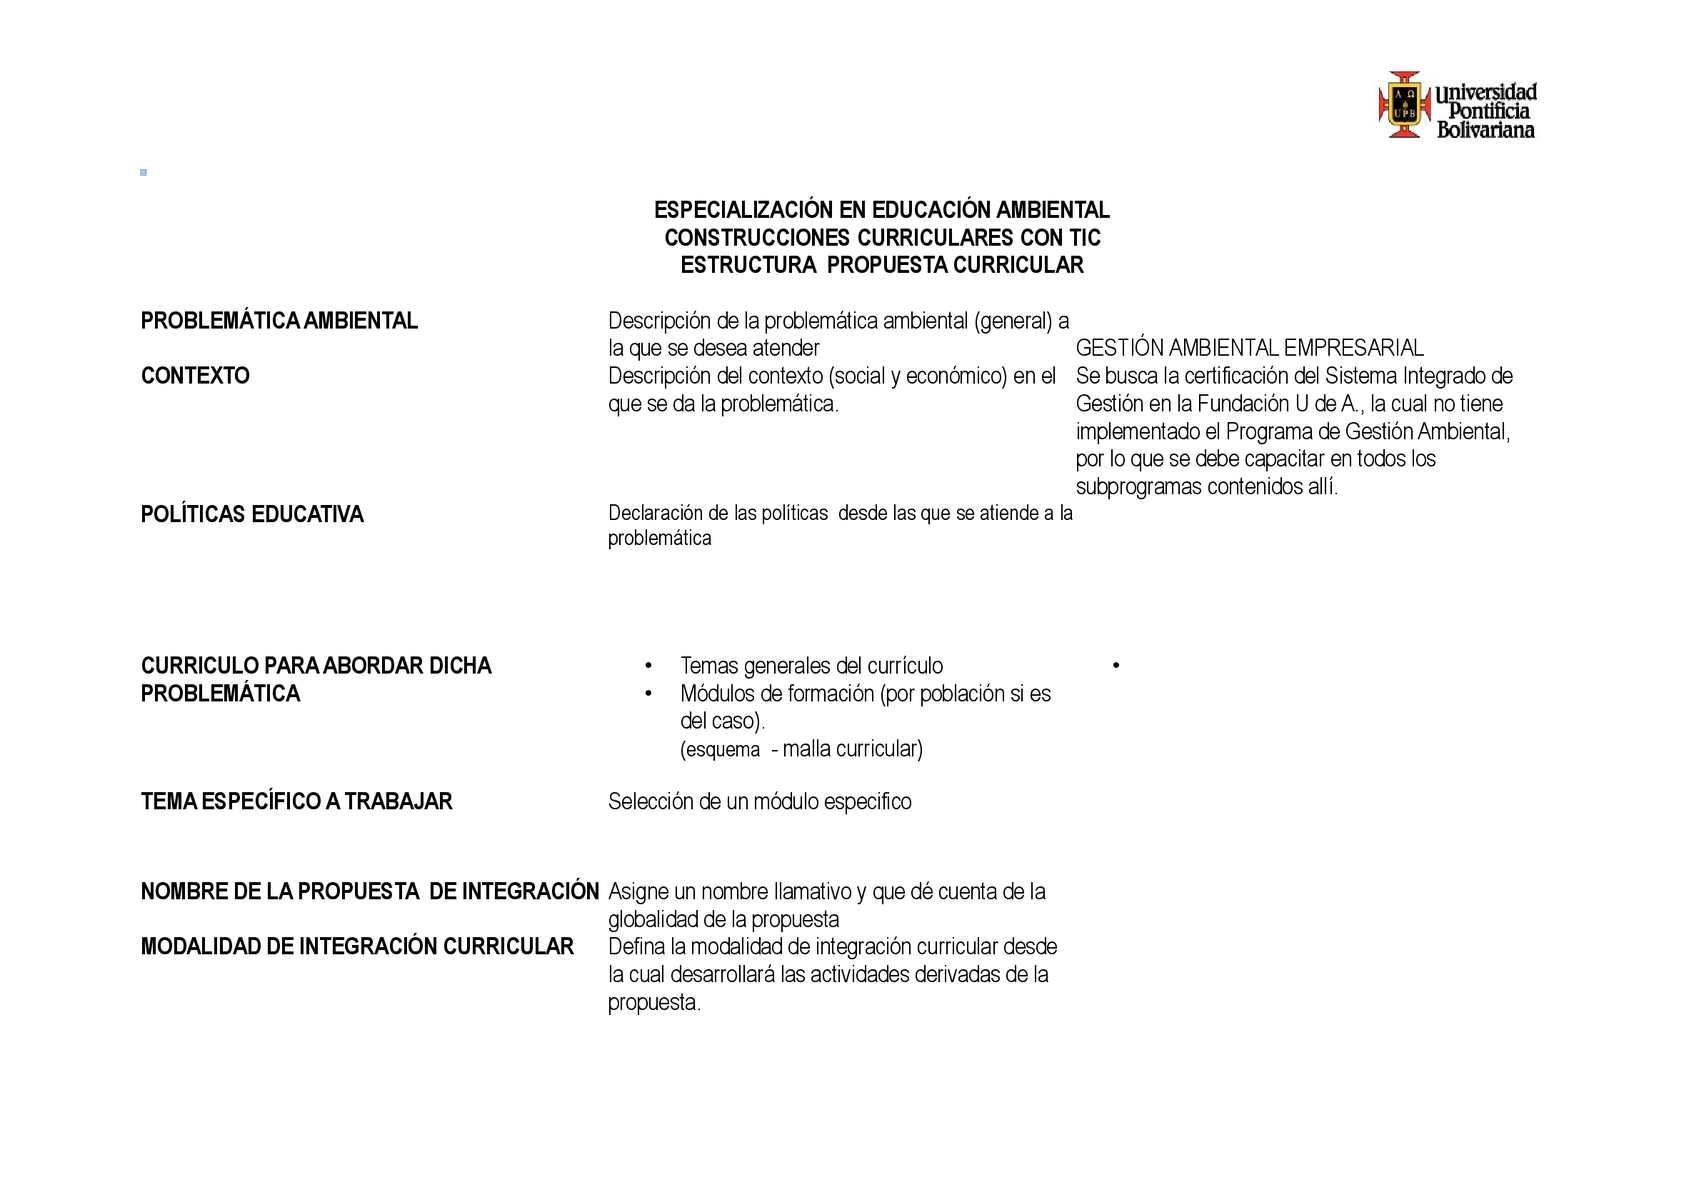 Calaméo Avances Propuesta Curricular 3